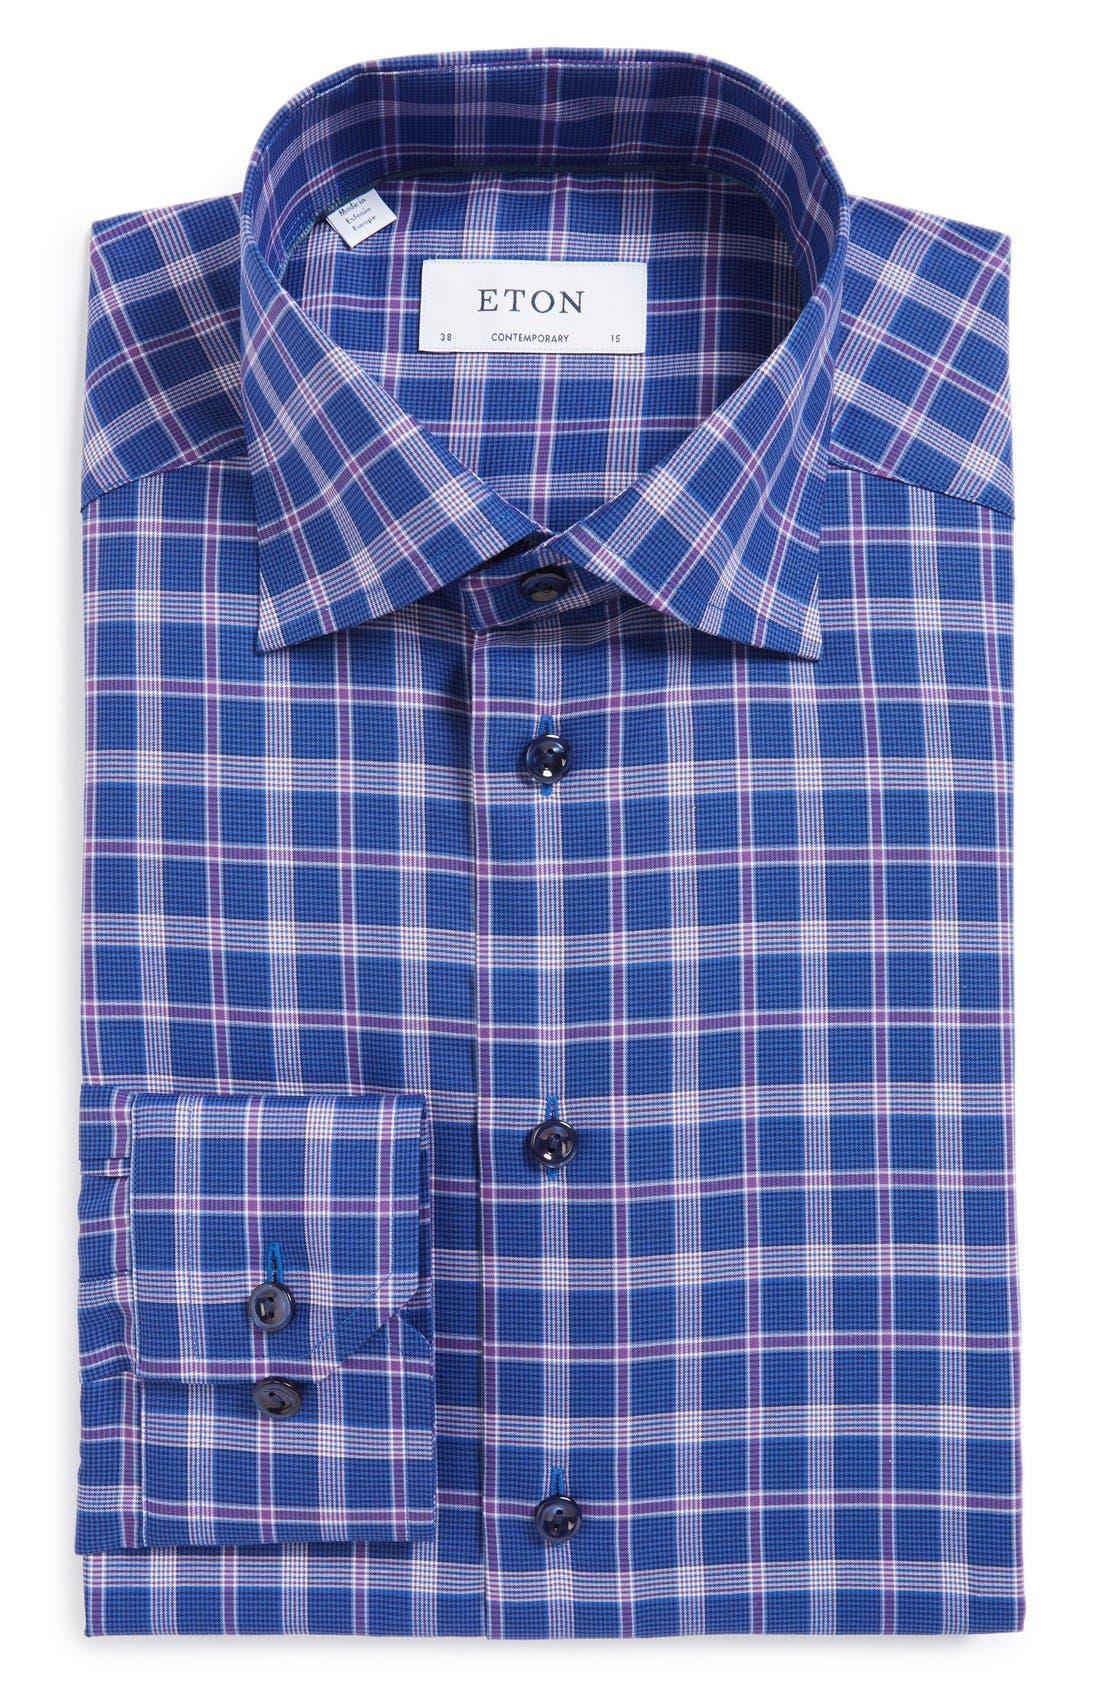 ETON Contemporary Fit Plaid Dress Shirt, Main, color, 500